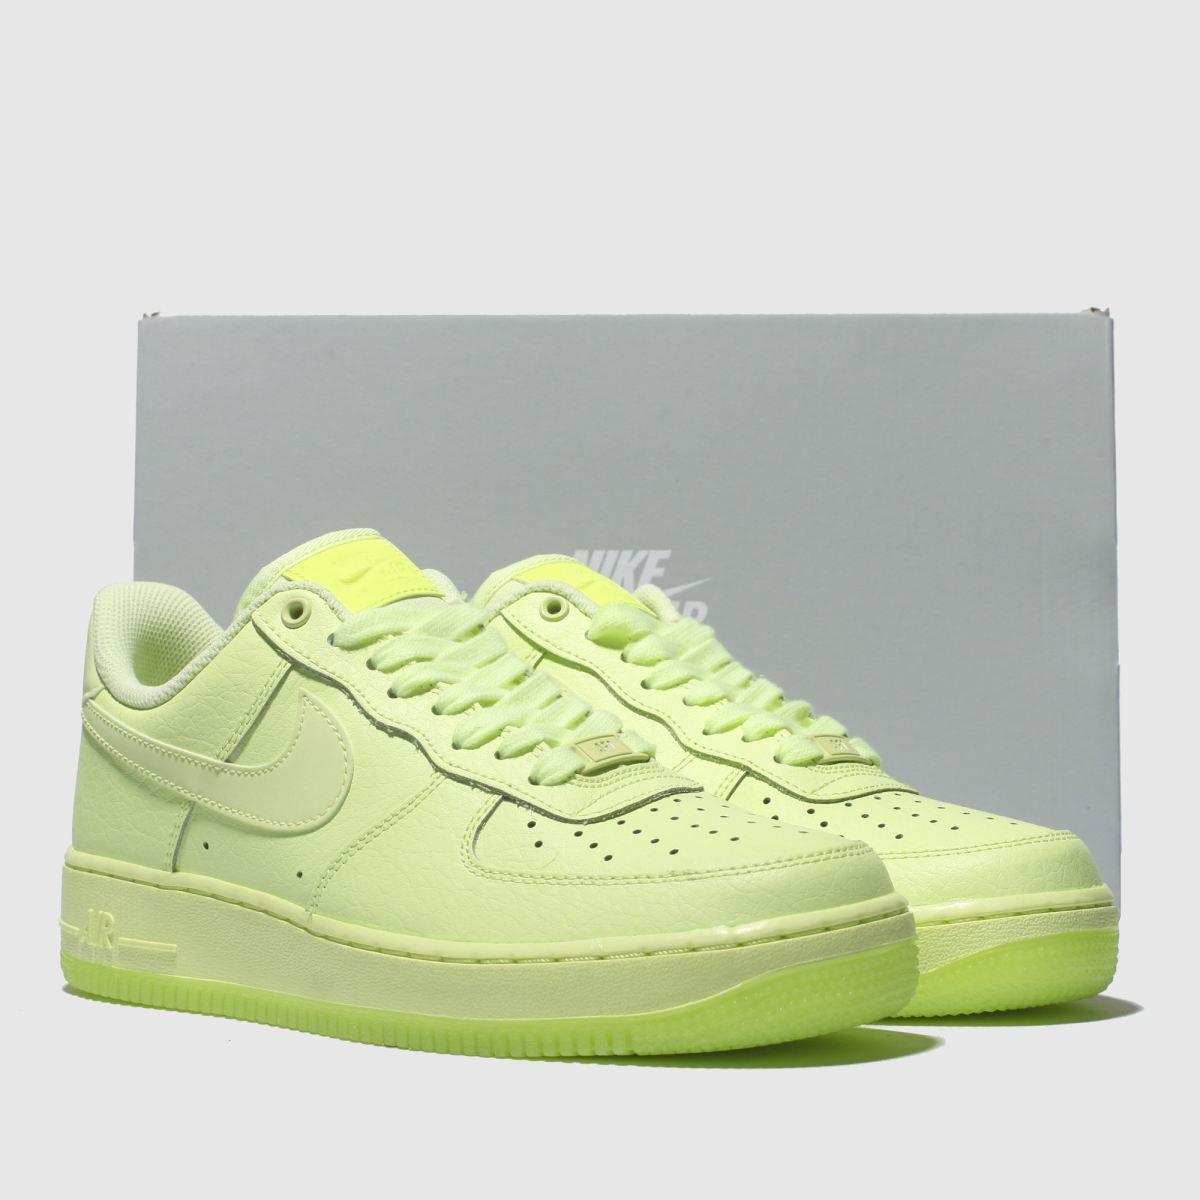 Nike Sportswear Kinder Schuh Air Force 1 Mid LV Wheat